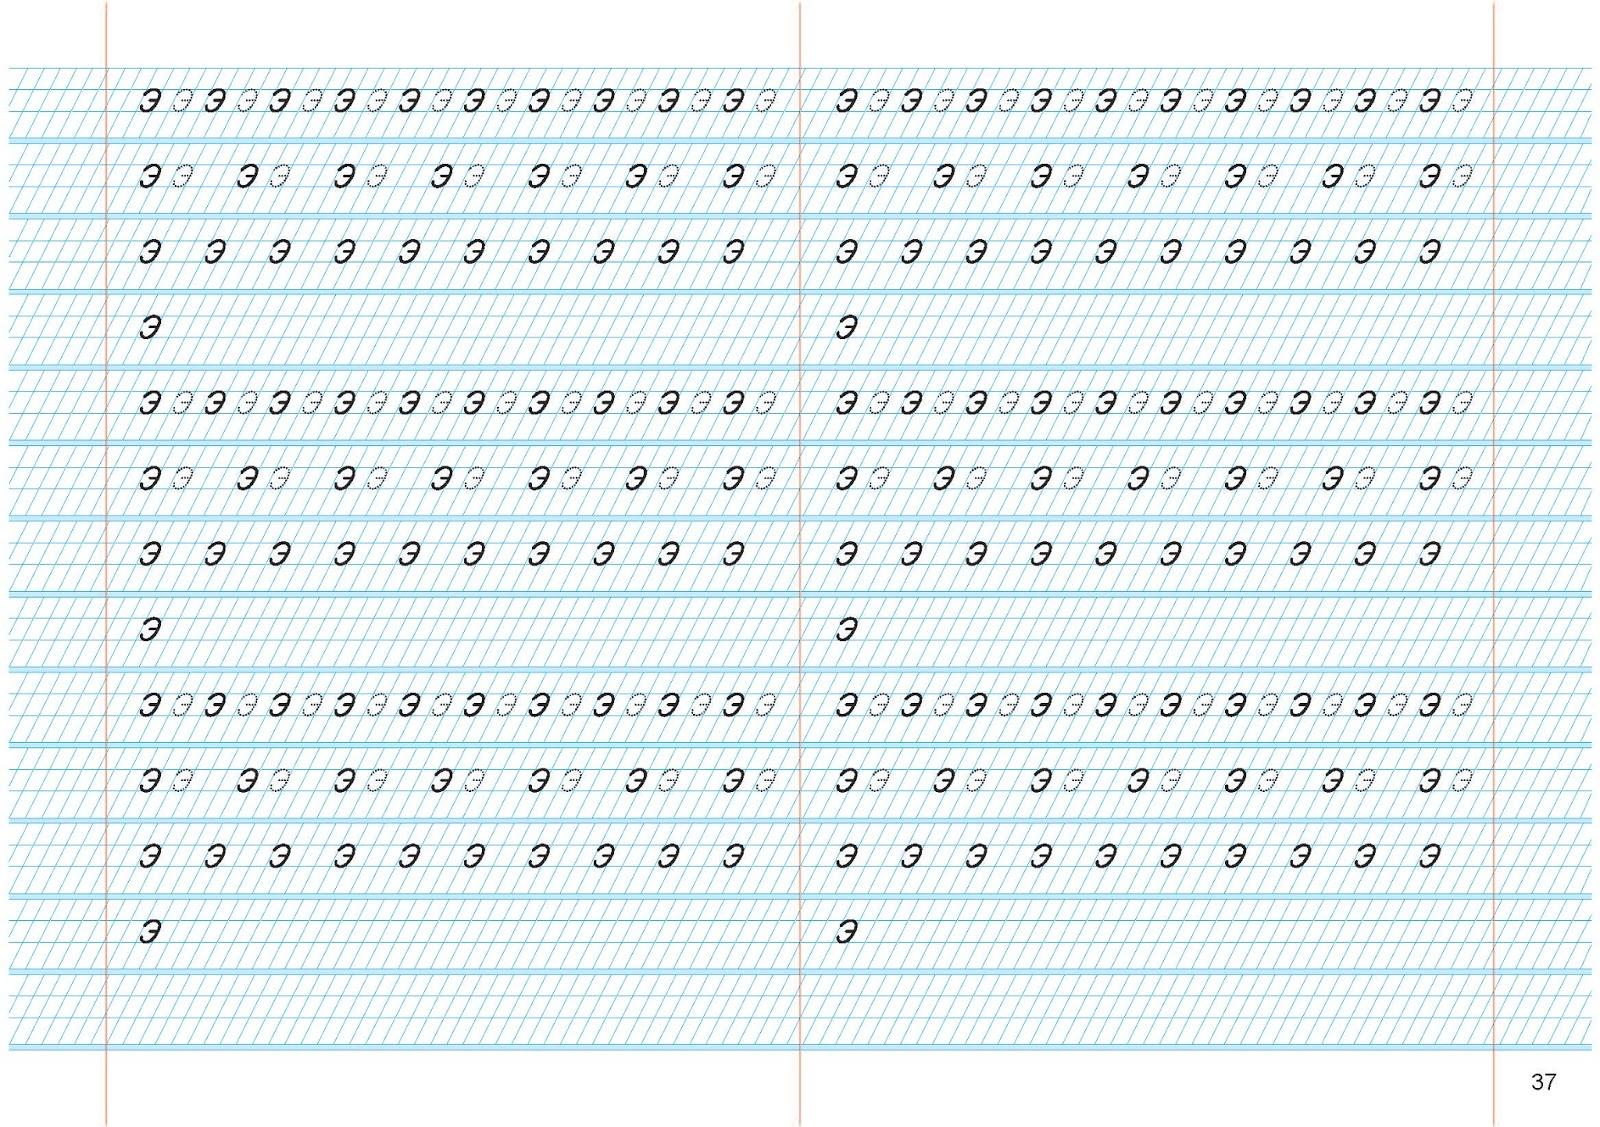 Alfabeto Ruso En Letras Cursivas Modelo De Escritura De A A Ya